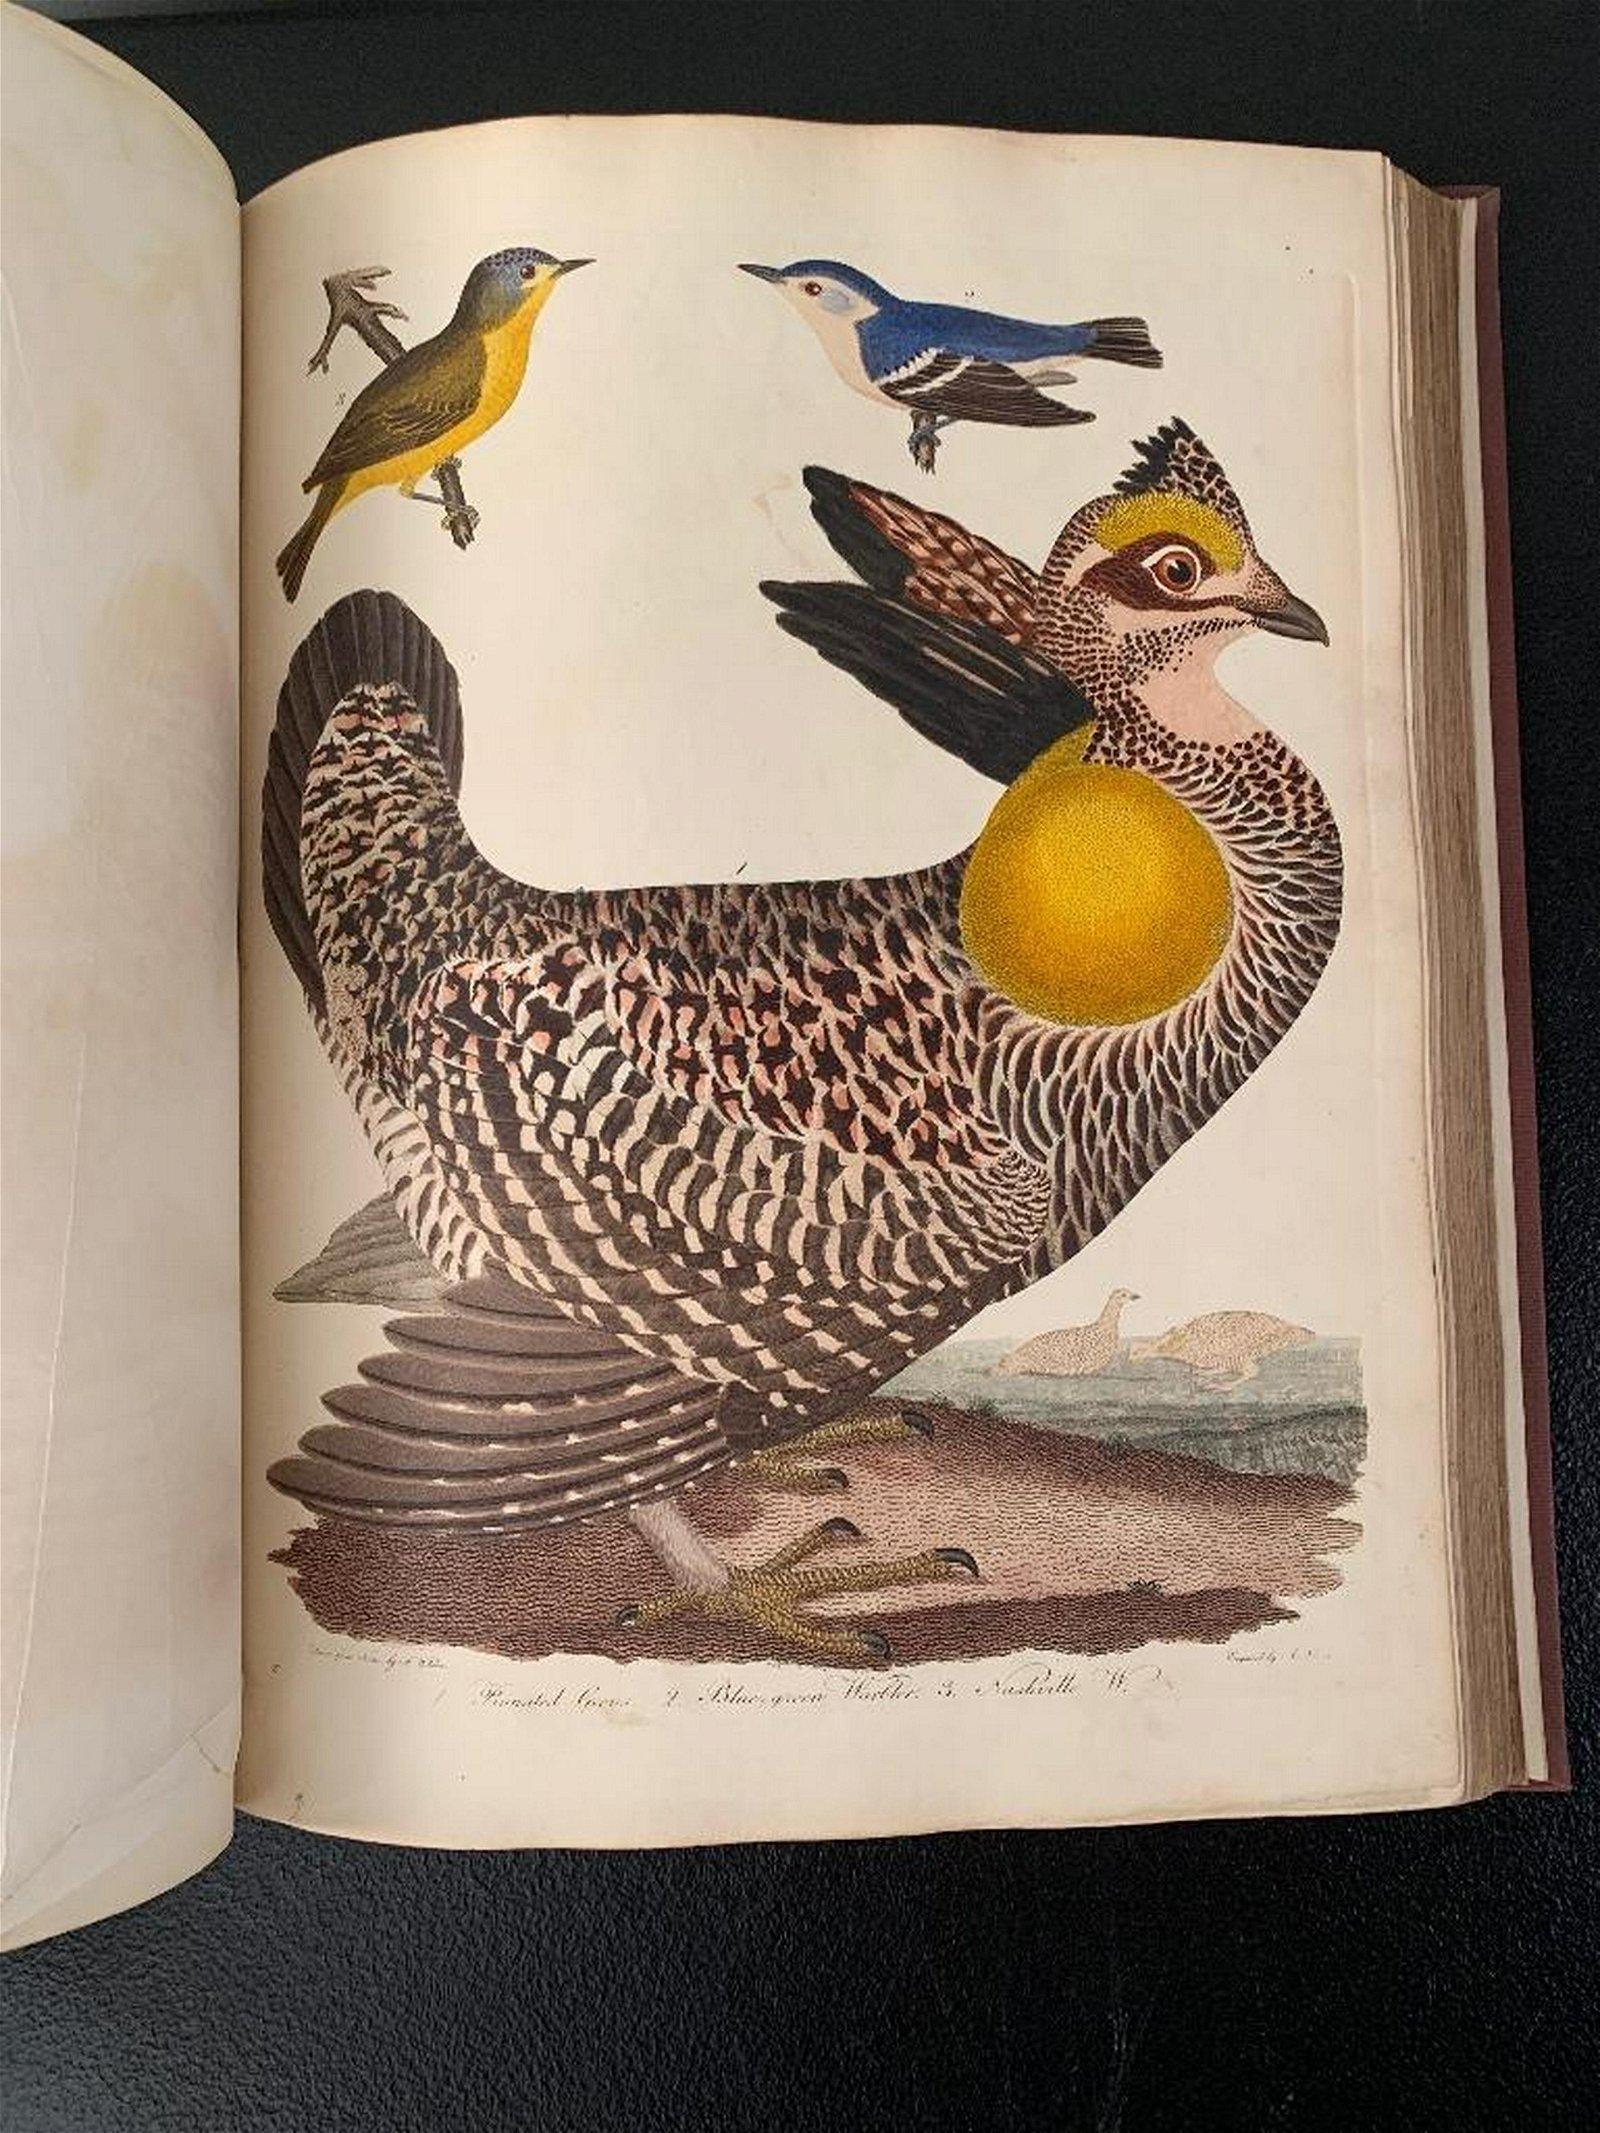 Wilson,Alexander, American Ornithology, Plates